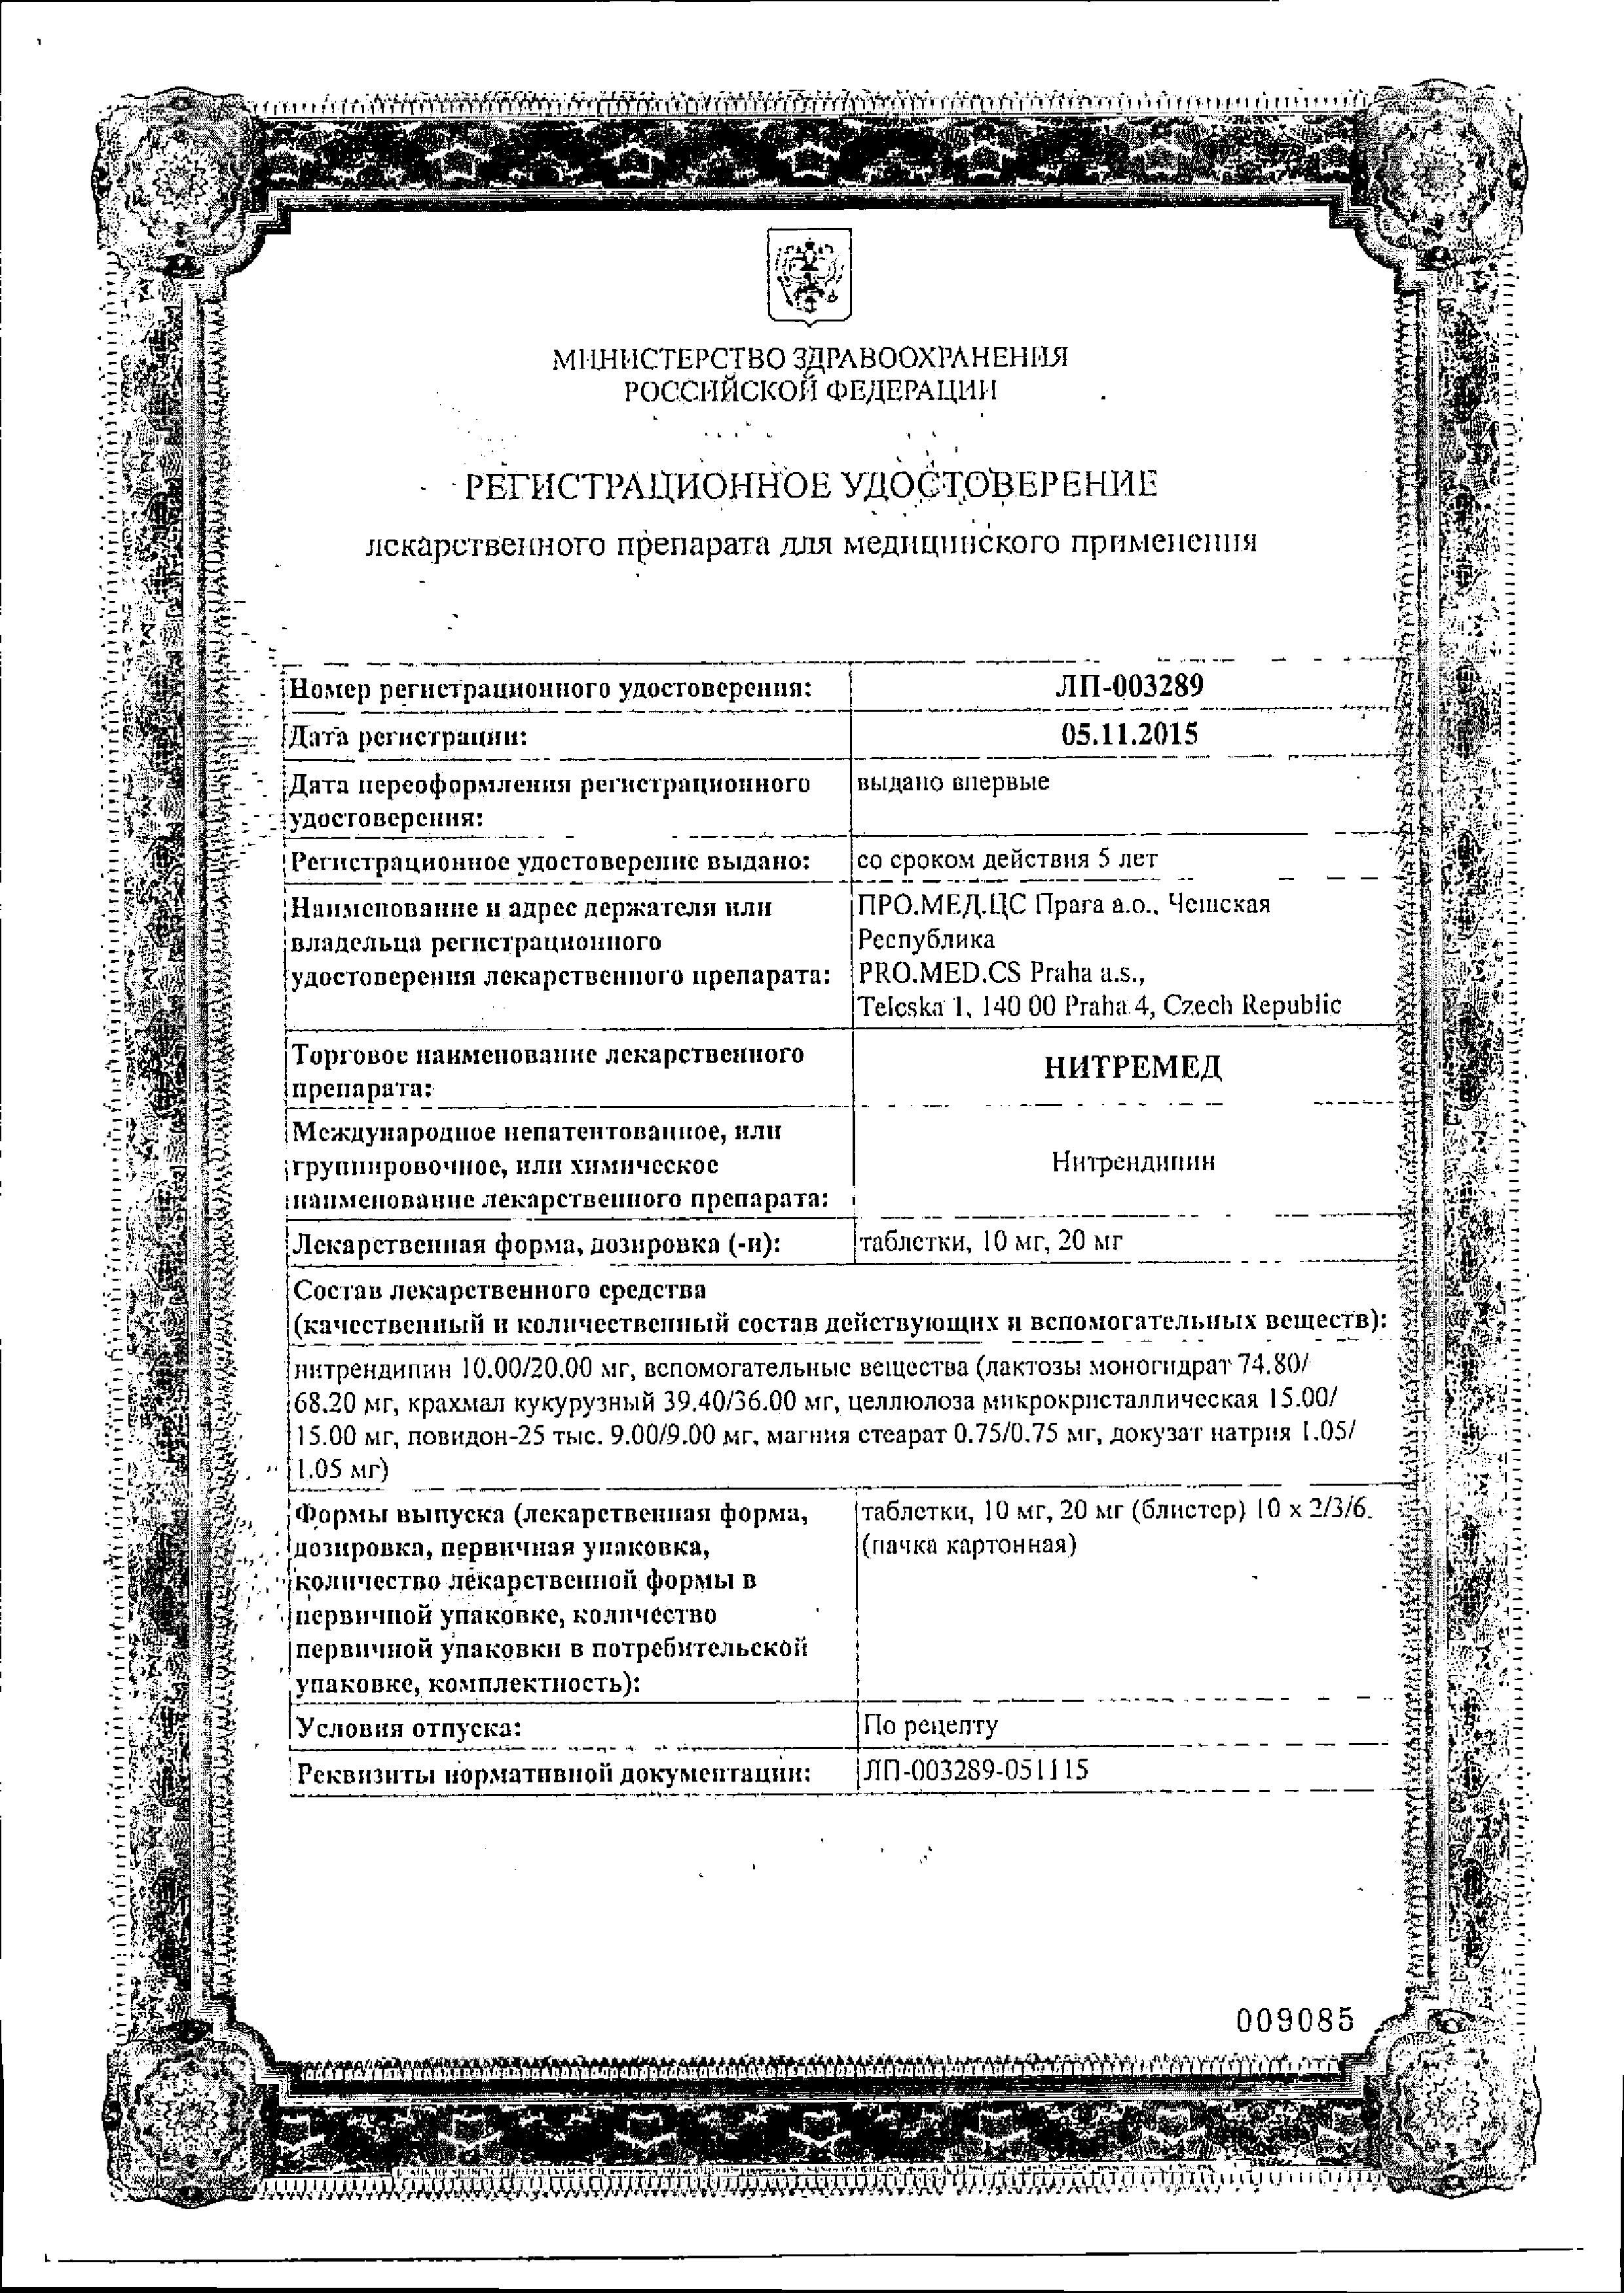 Нитремед сертификат